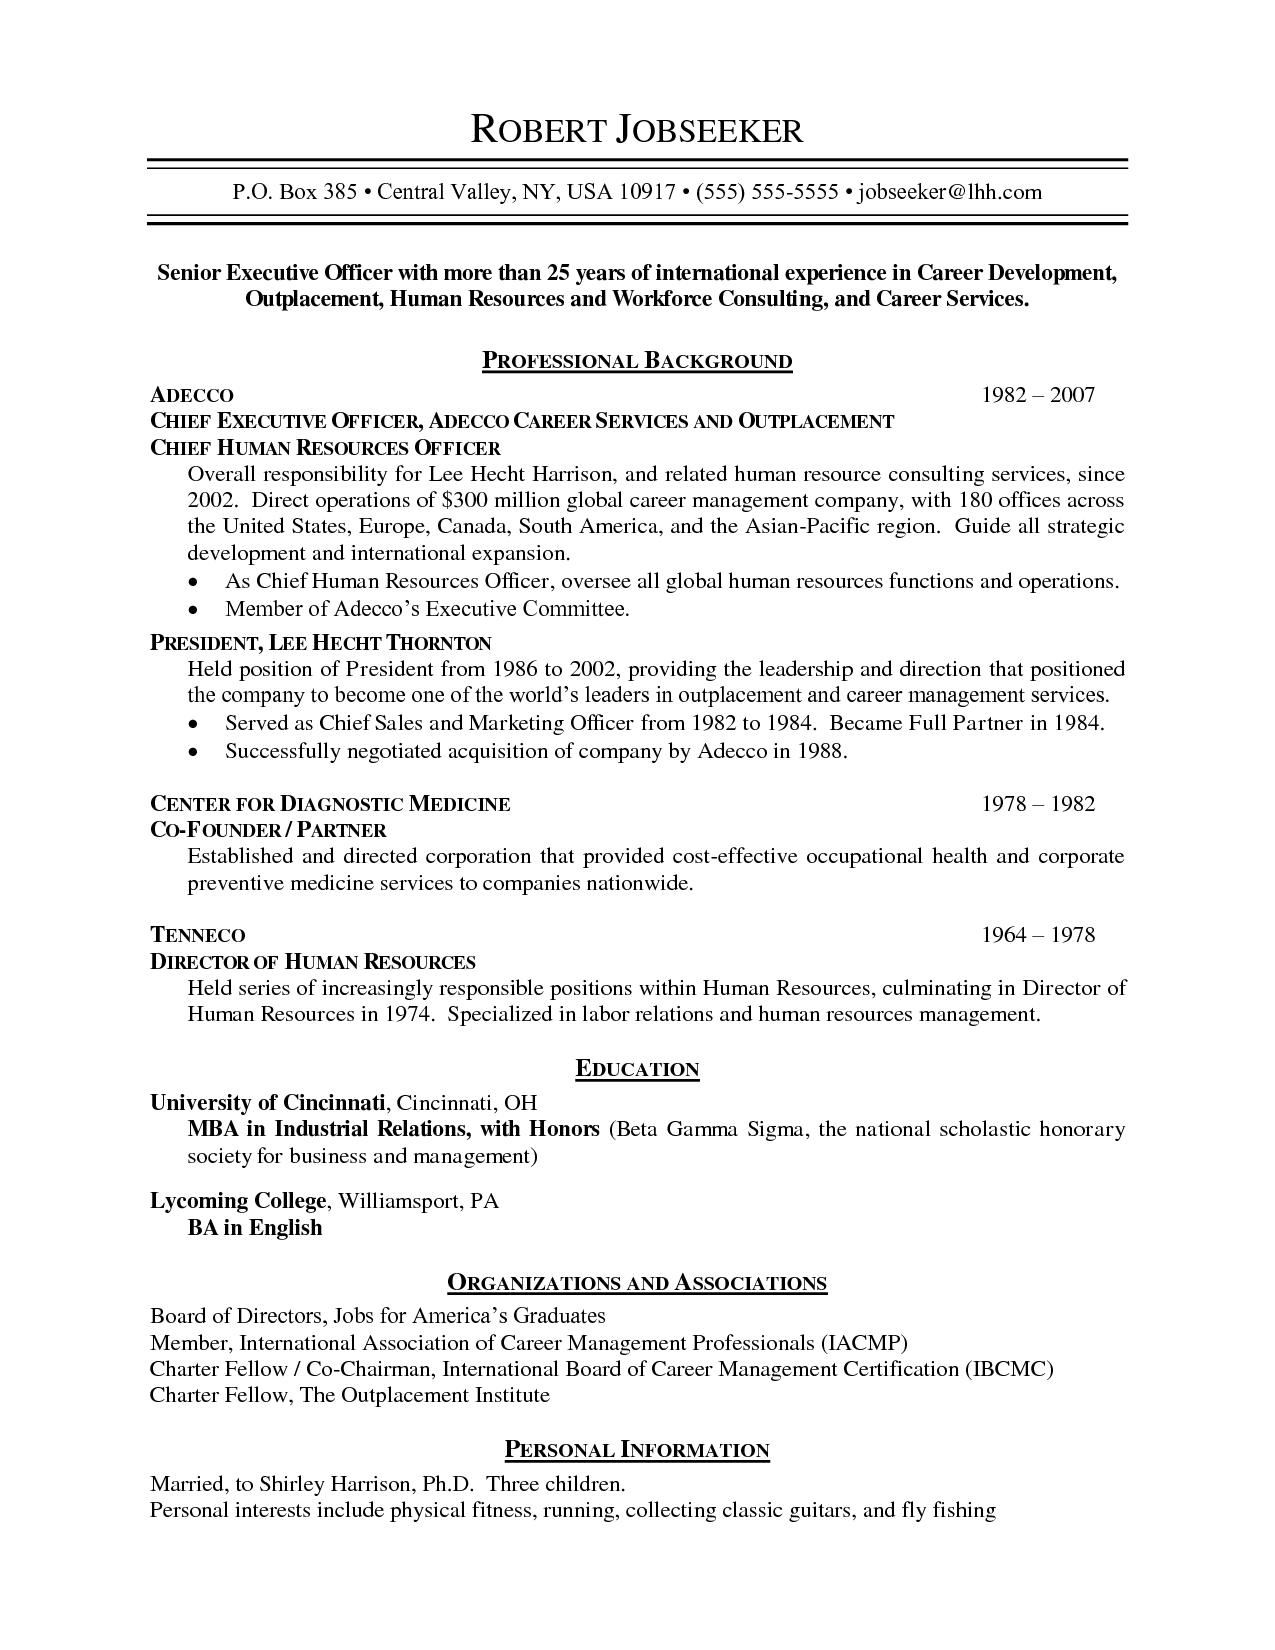 Resume Format Not Chronological